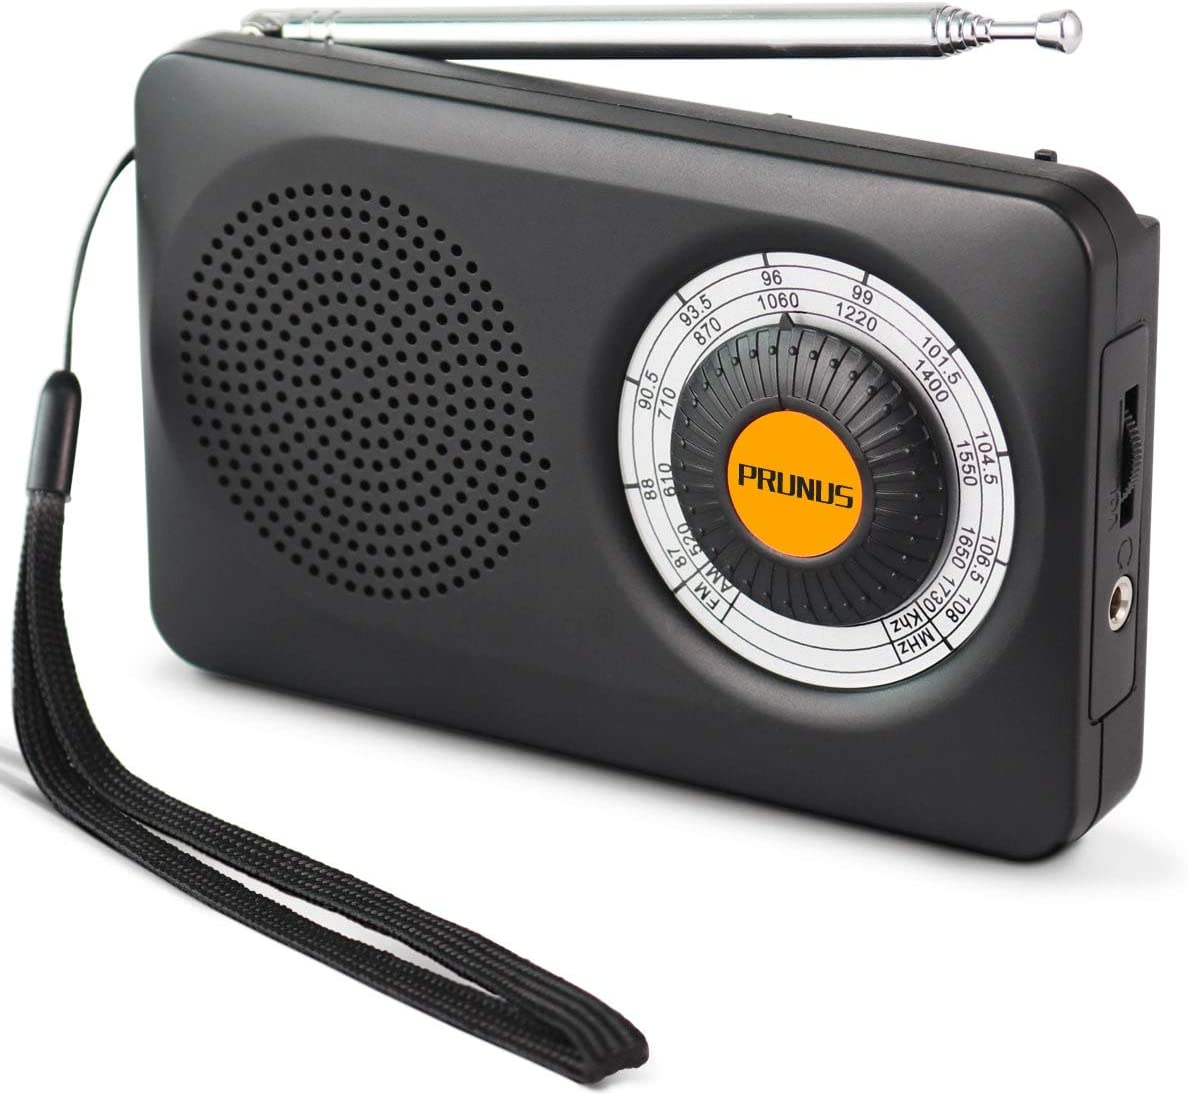 PRUNUS J-115 Pequeña Radio Portátil, Am FM Radio Analógica de Bolsillo, Radio de Transistor a Batería con Auriculares, Antena Giratoria de 360 °, 2 ...